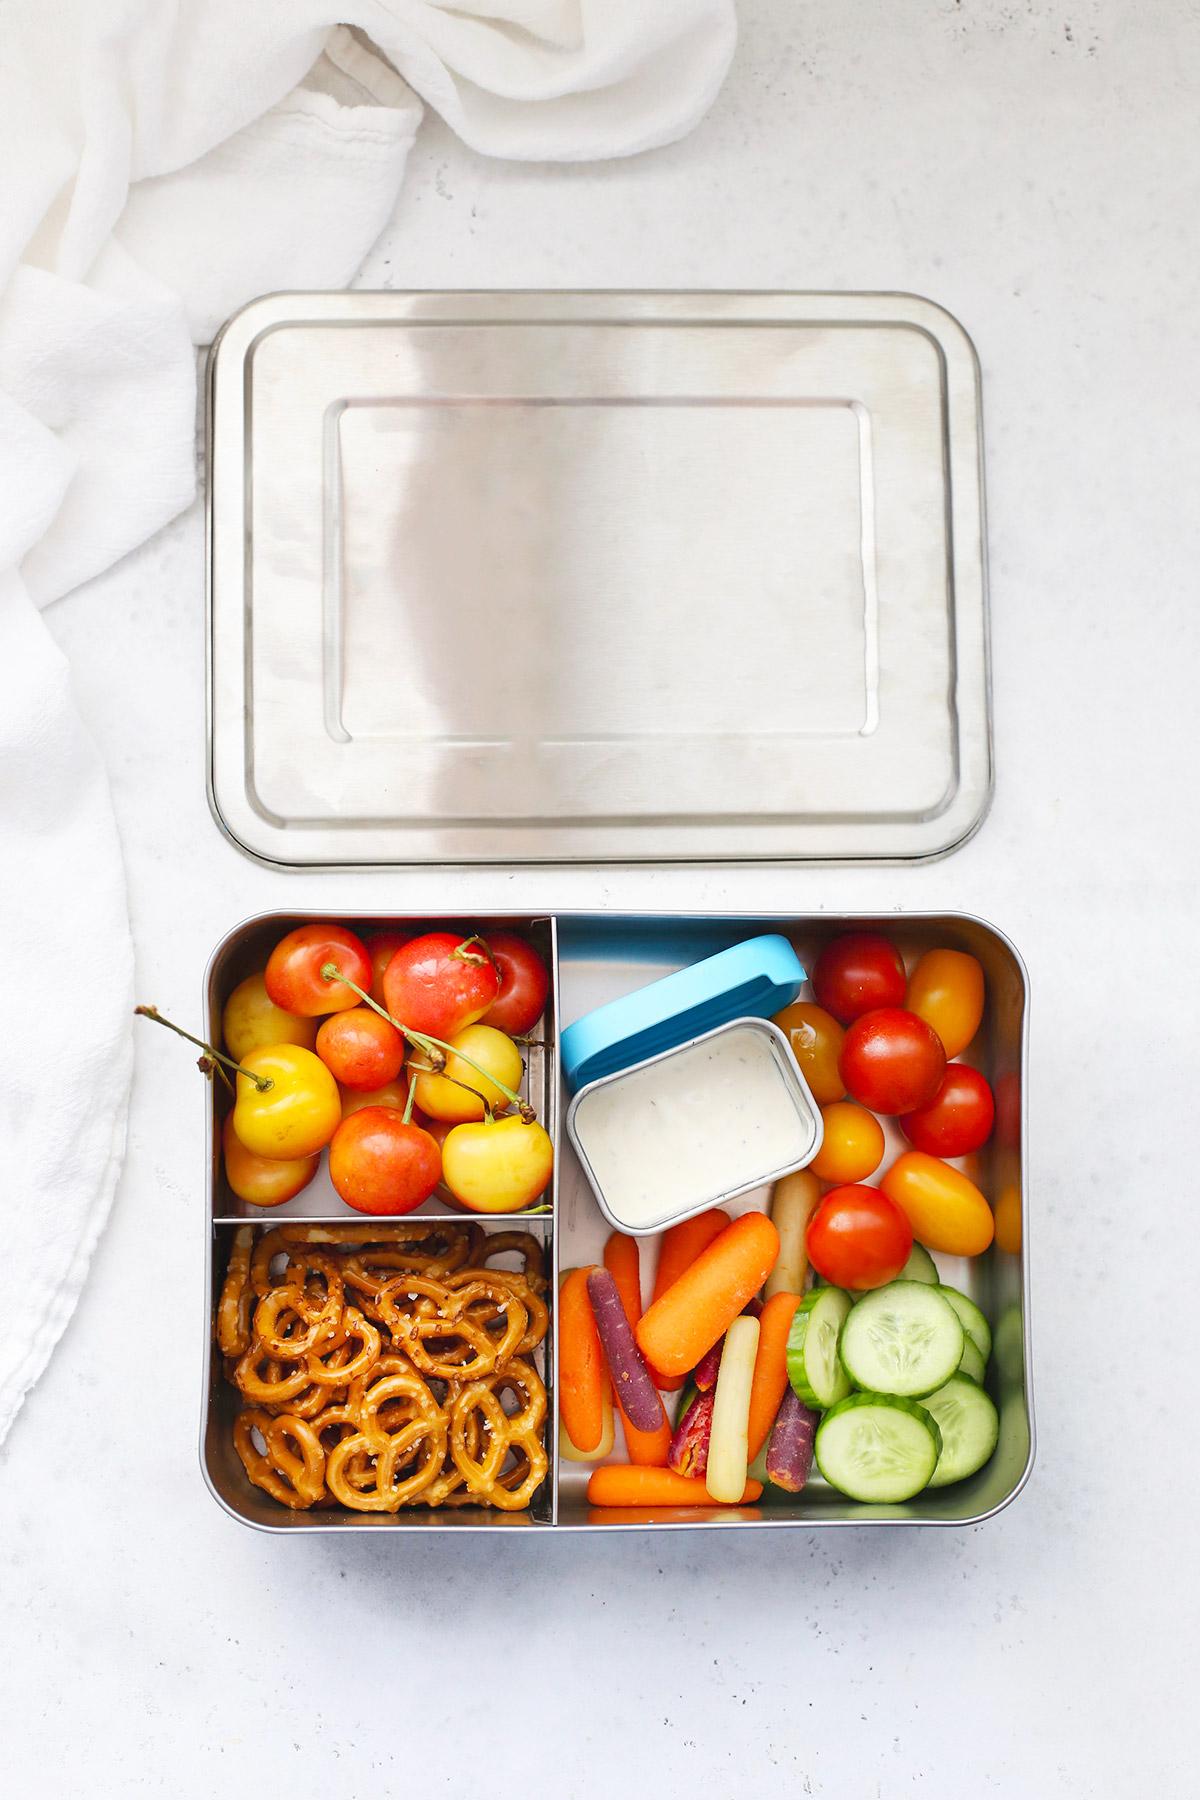 WeeSprout Stainless steel bento box with rainier cherries, gluten-free pretzels, ranch dip, and fresh veggies